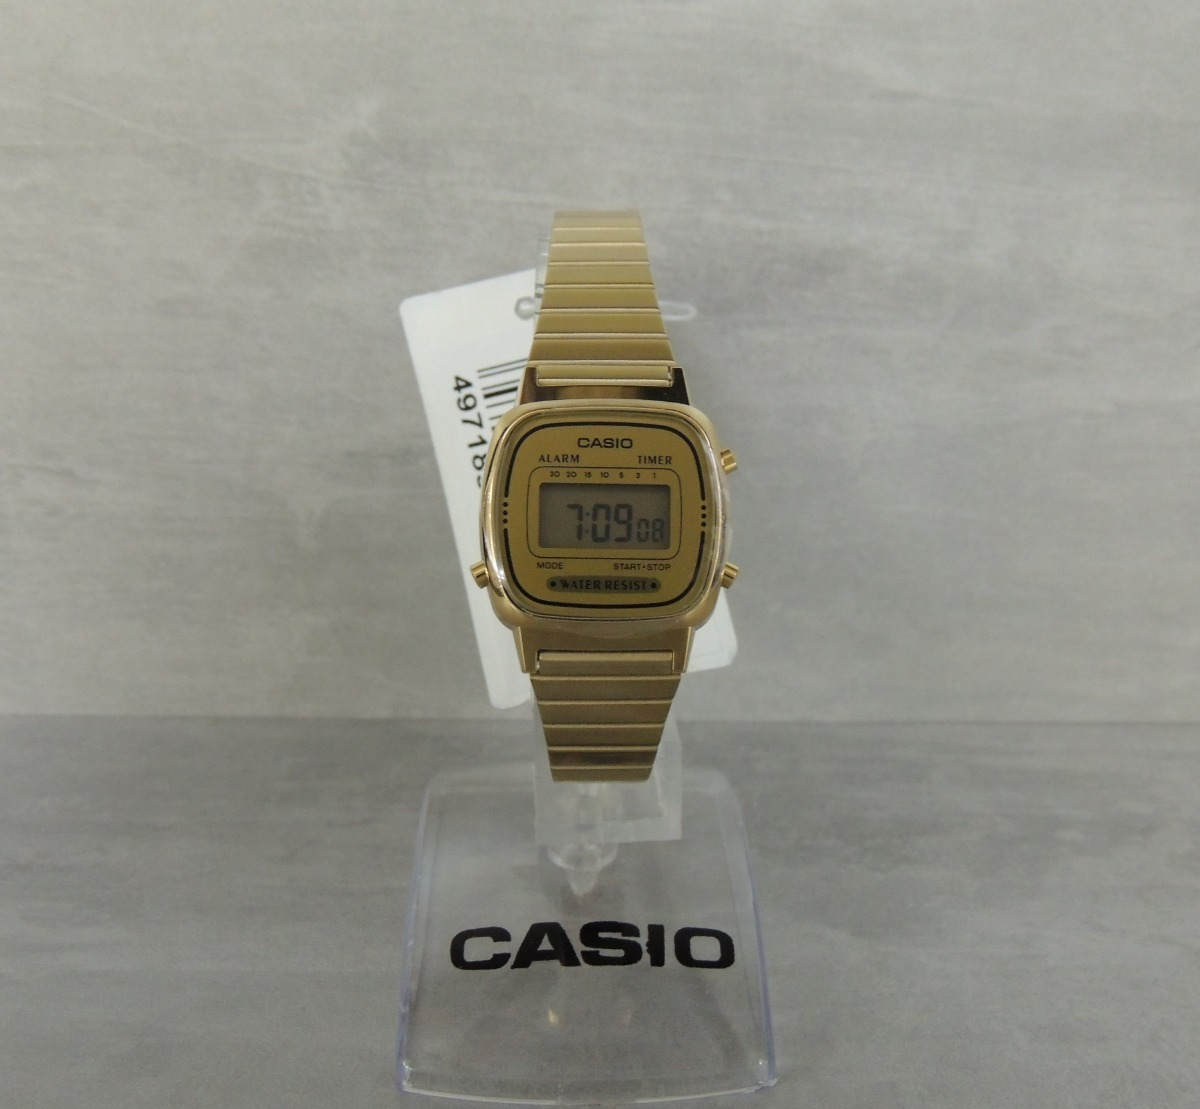 c03a05b67bb Relógio Casio Vintage Mini La670wga-9df - Nf E Garantia - R  308